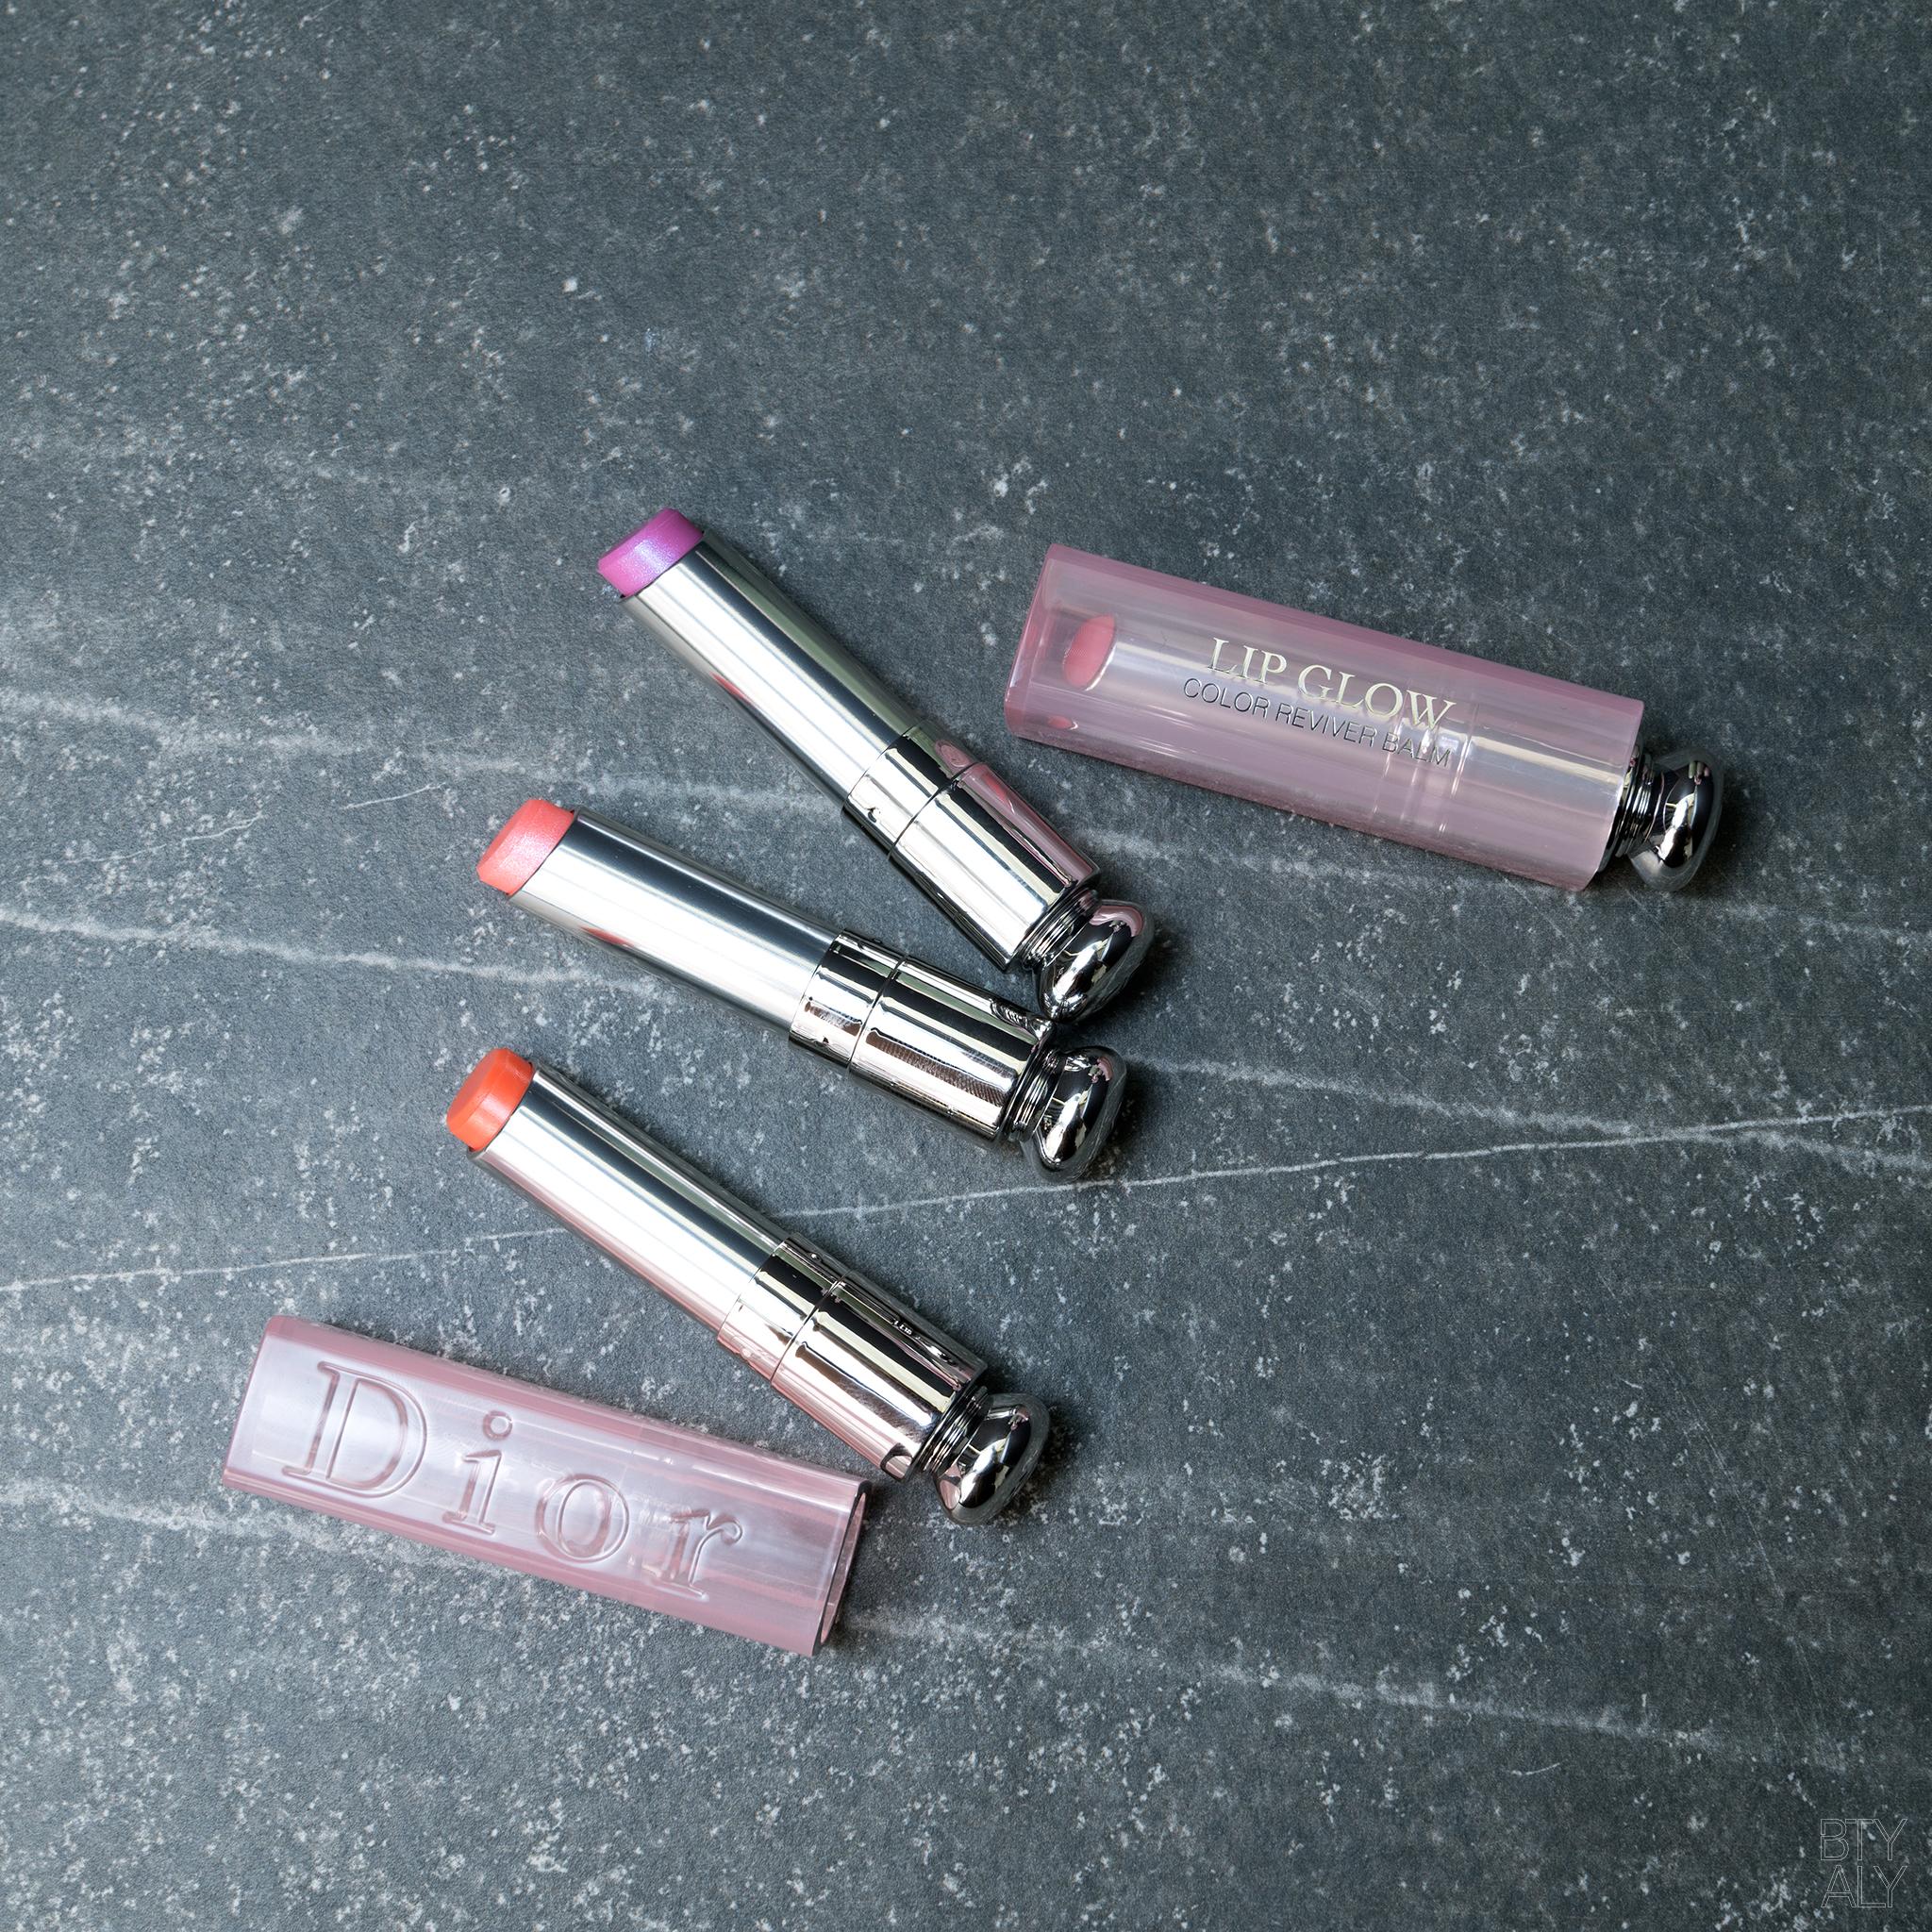 Dior Addict Lip Glow lip balms